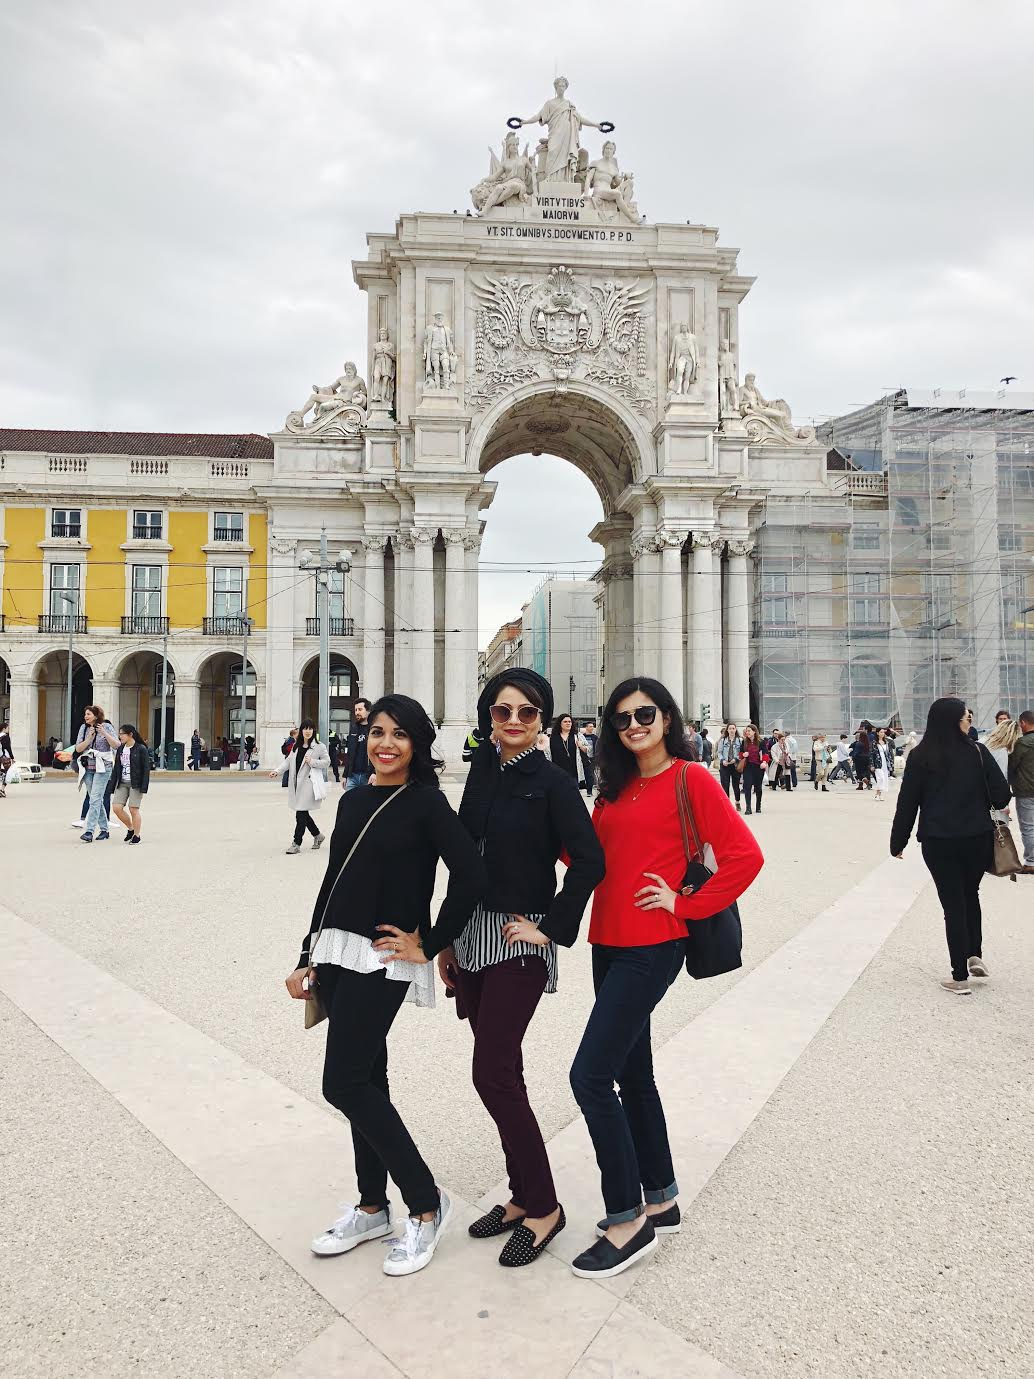 Lisbon-halal-travel-guide-tips-Rua-Augusta-Arch